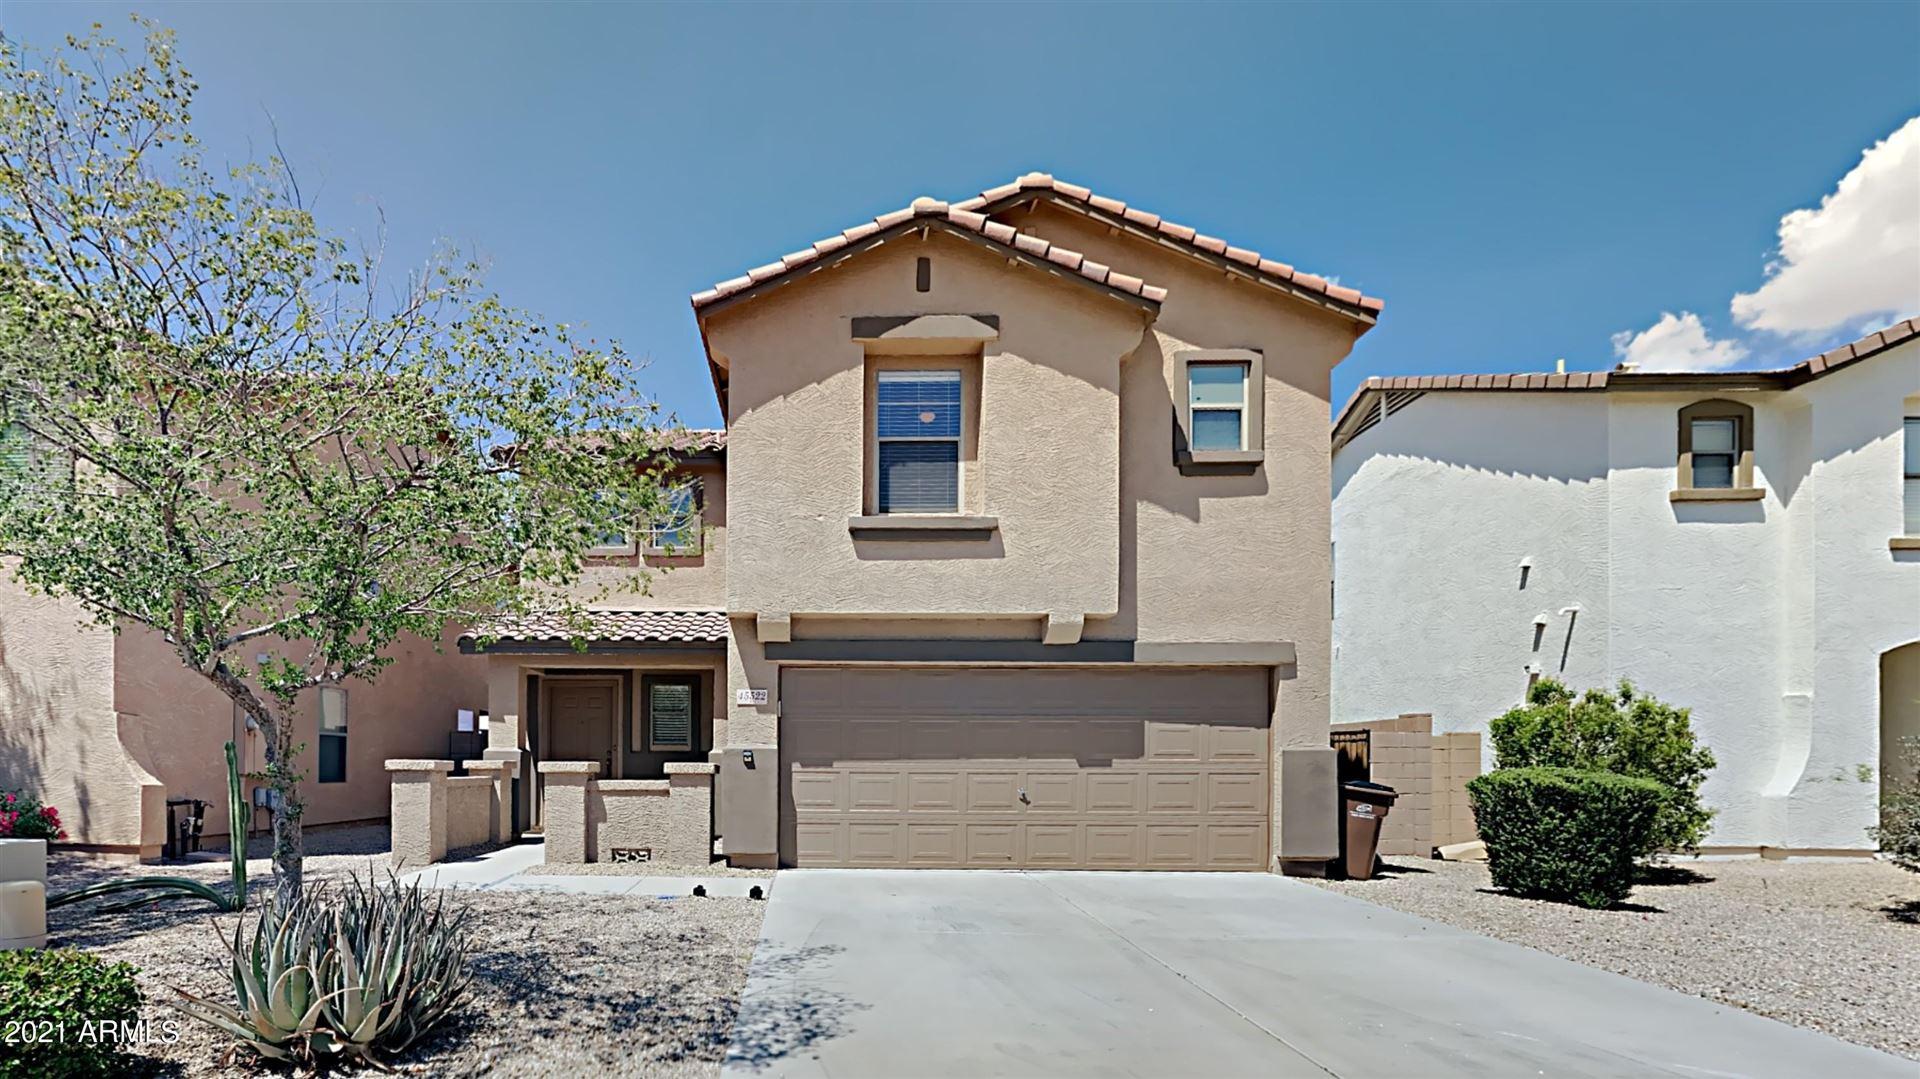 Photo for 45522 W Barbara Lane, Maricopa, AZ 85139 (MLS # 6280886)